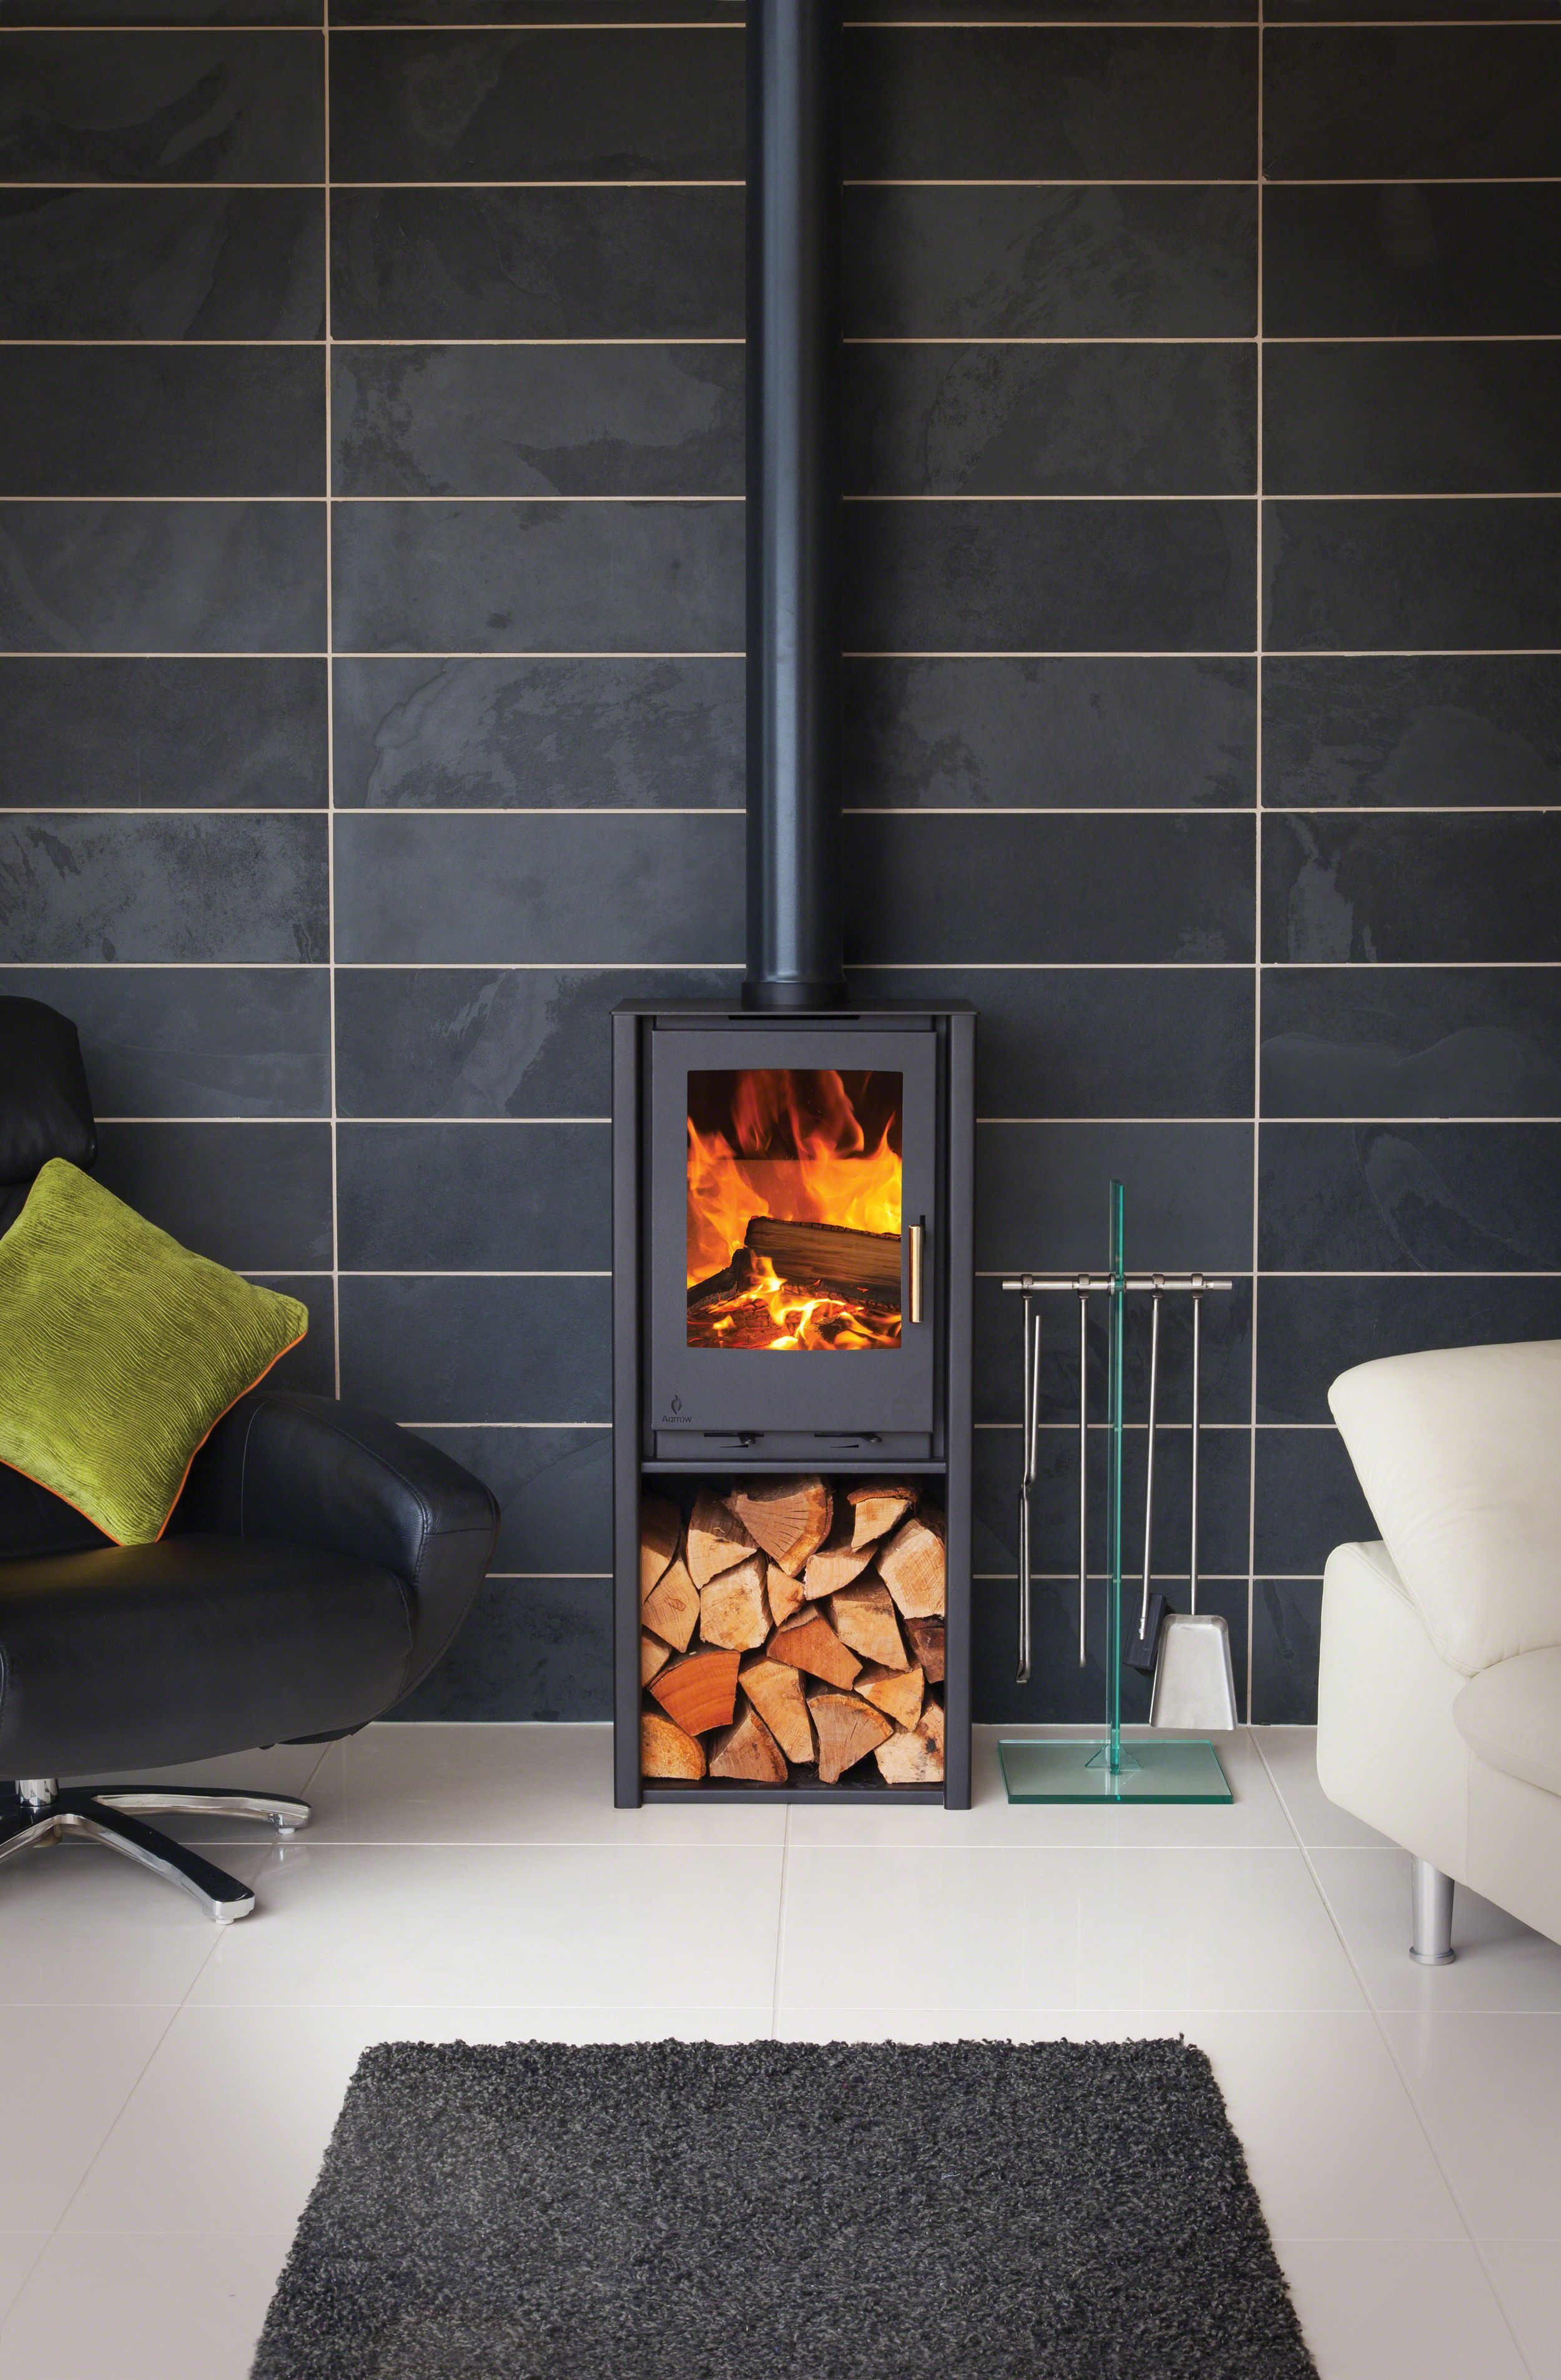 I600 Slimline Freestanding Low Freestanding Freestandingfireplacewoodburninglogburner I6 Freestanding Fireplace Wood Burning Stoves Uk Wood Burning Stove